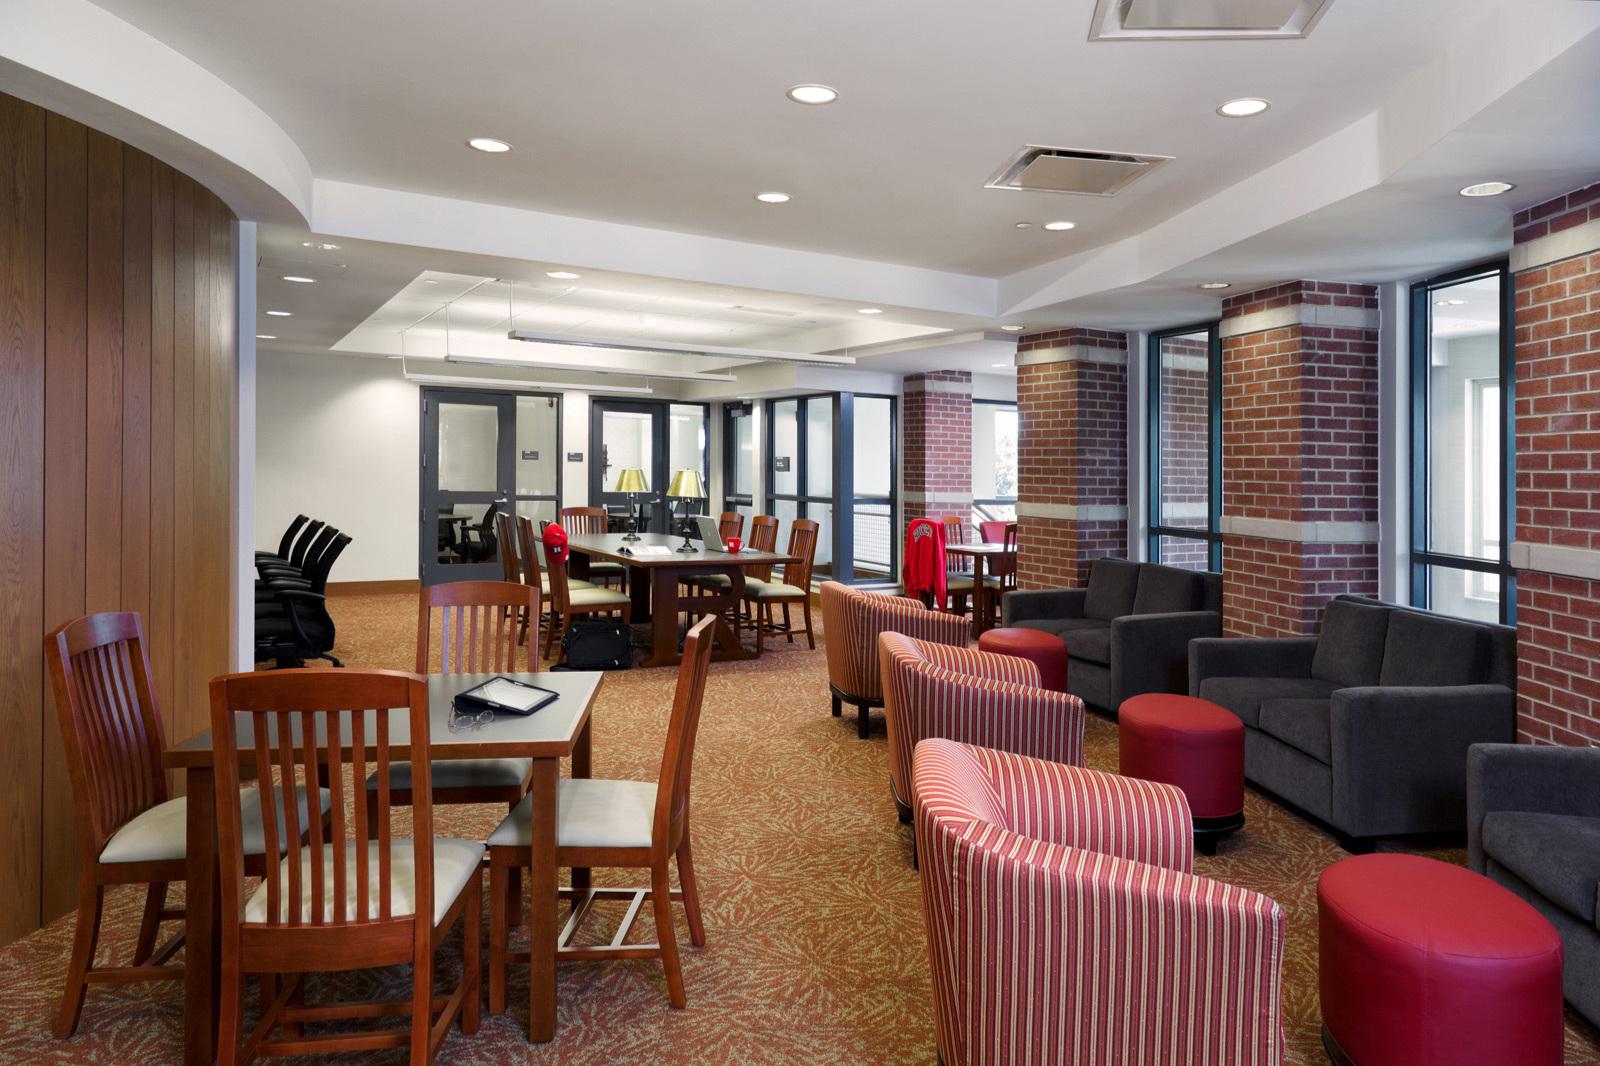 Rutgers University - B.E.S.T. Hall   Piscataway, NJ